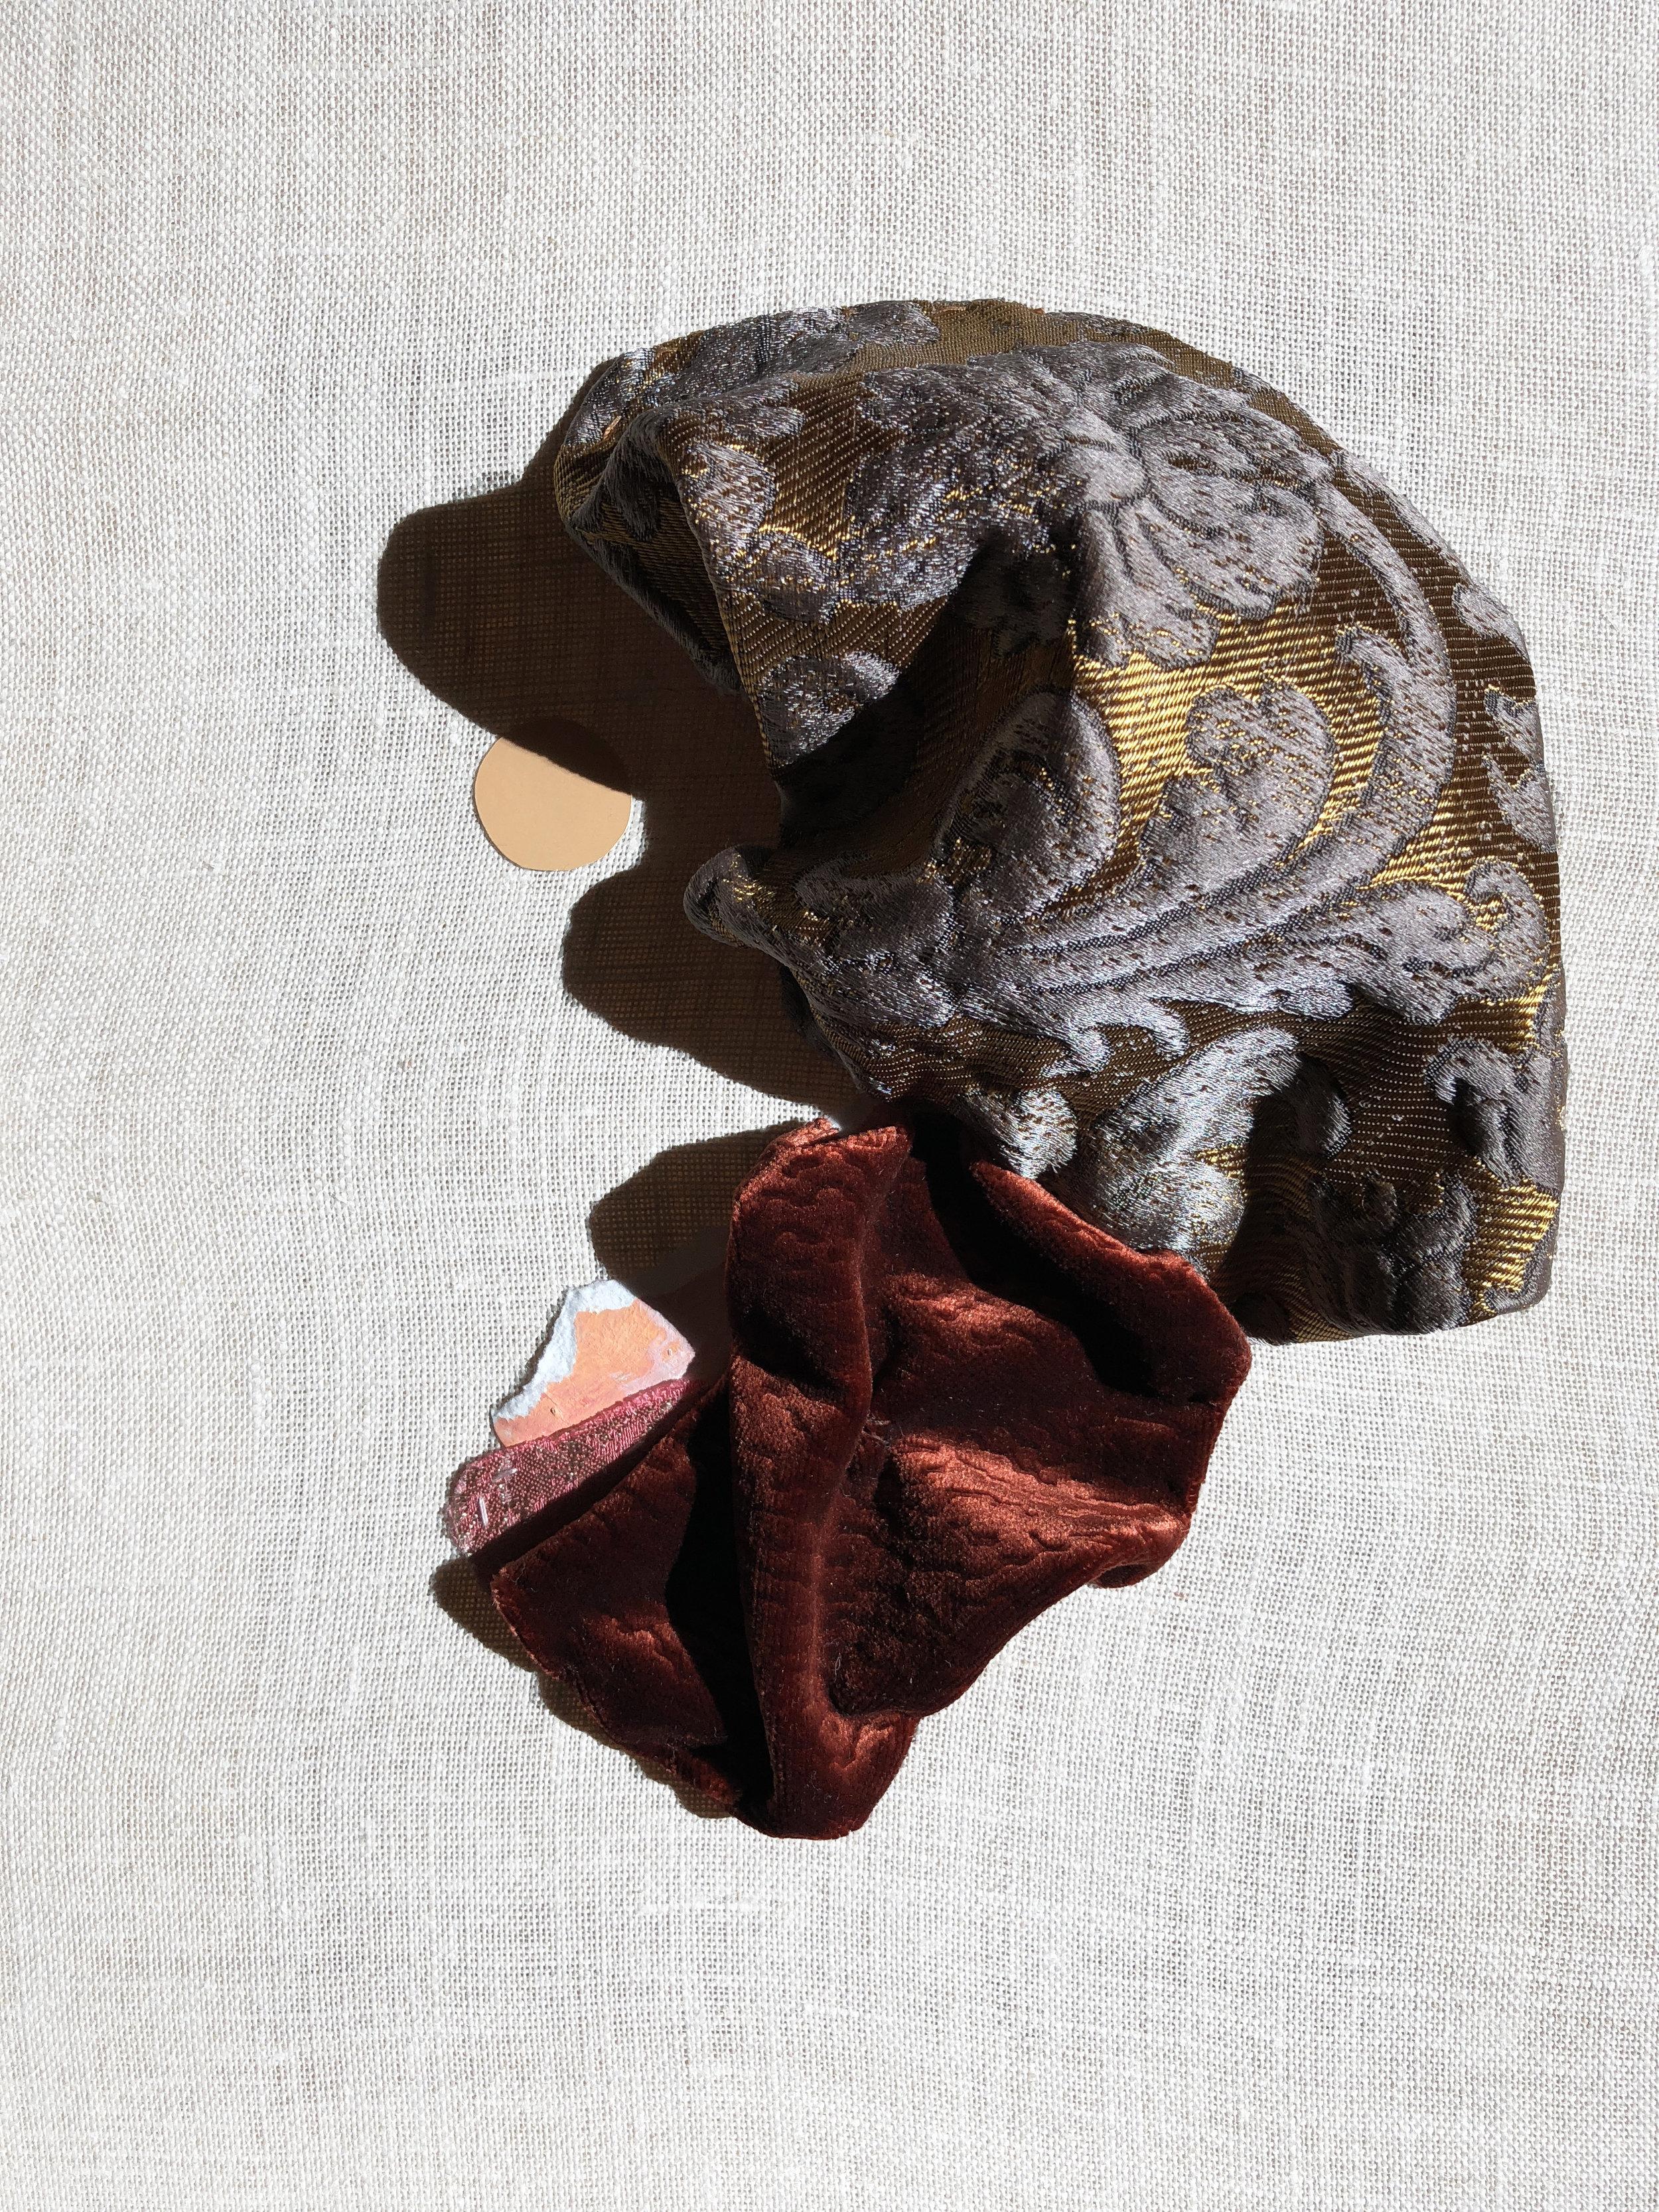 "9"" x 12"" Sculptural Collage on Linen, 2017"